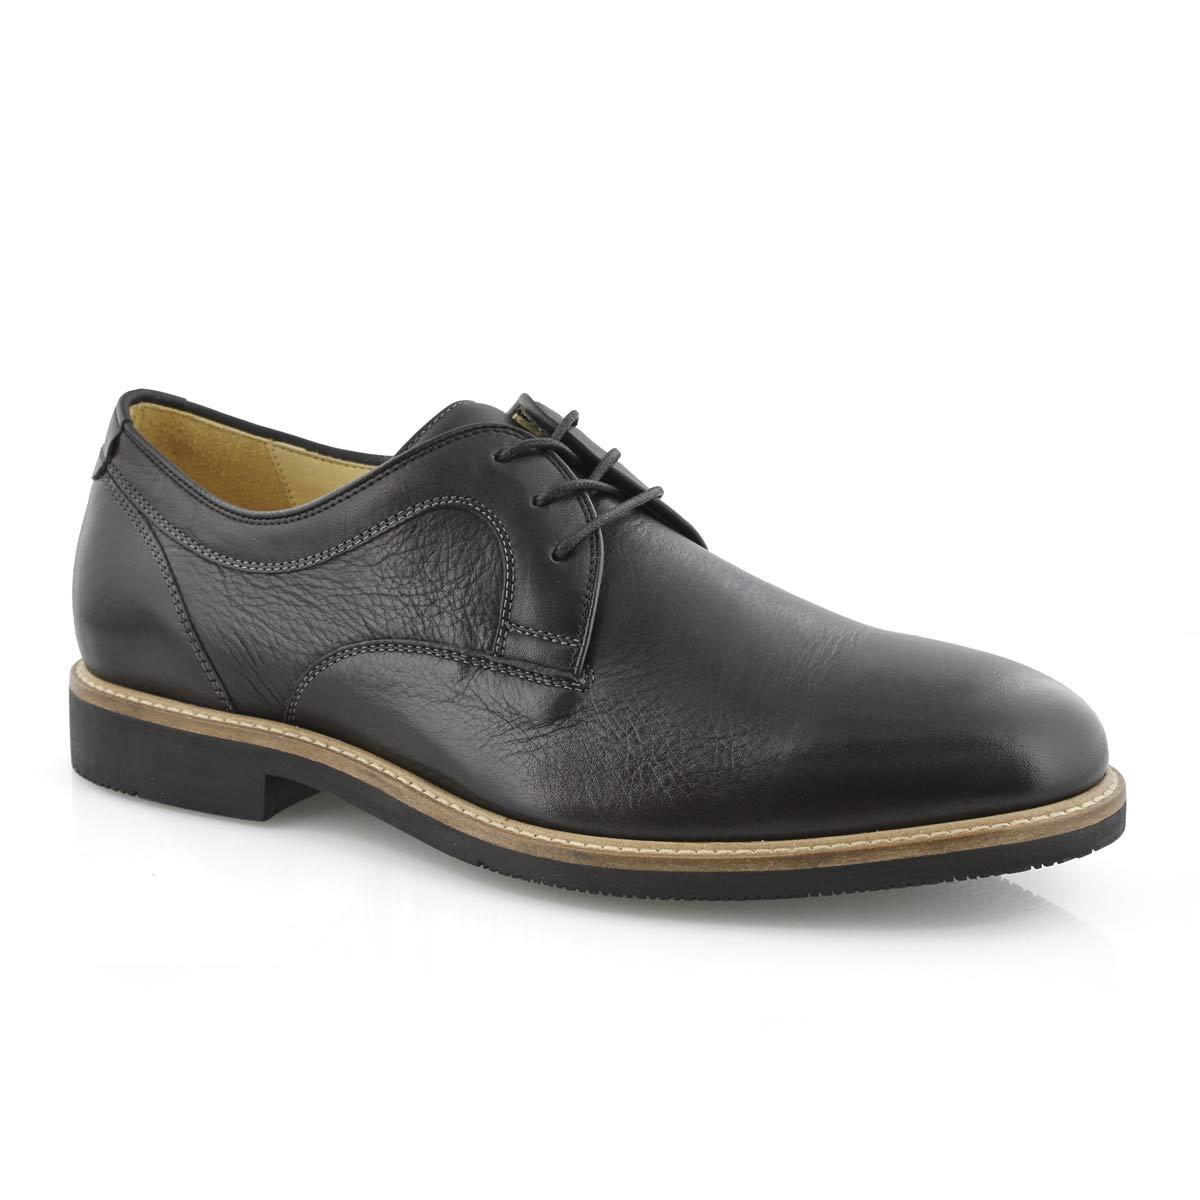 Men's BARLOW PLAIN TOE black dress oxfords